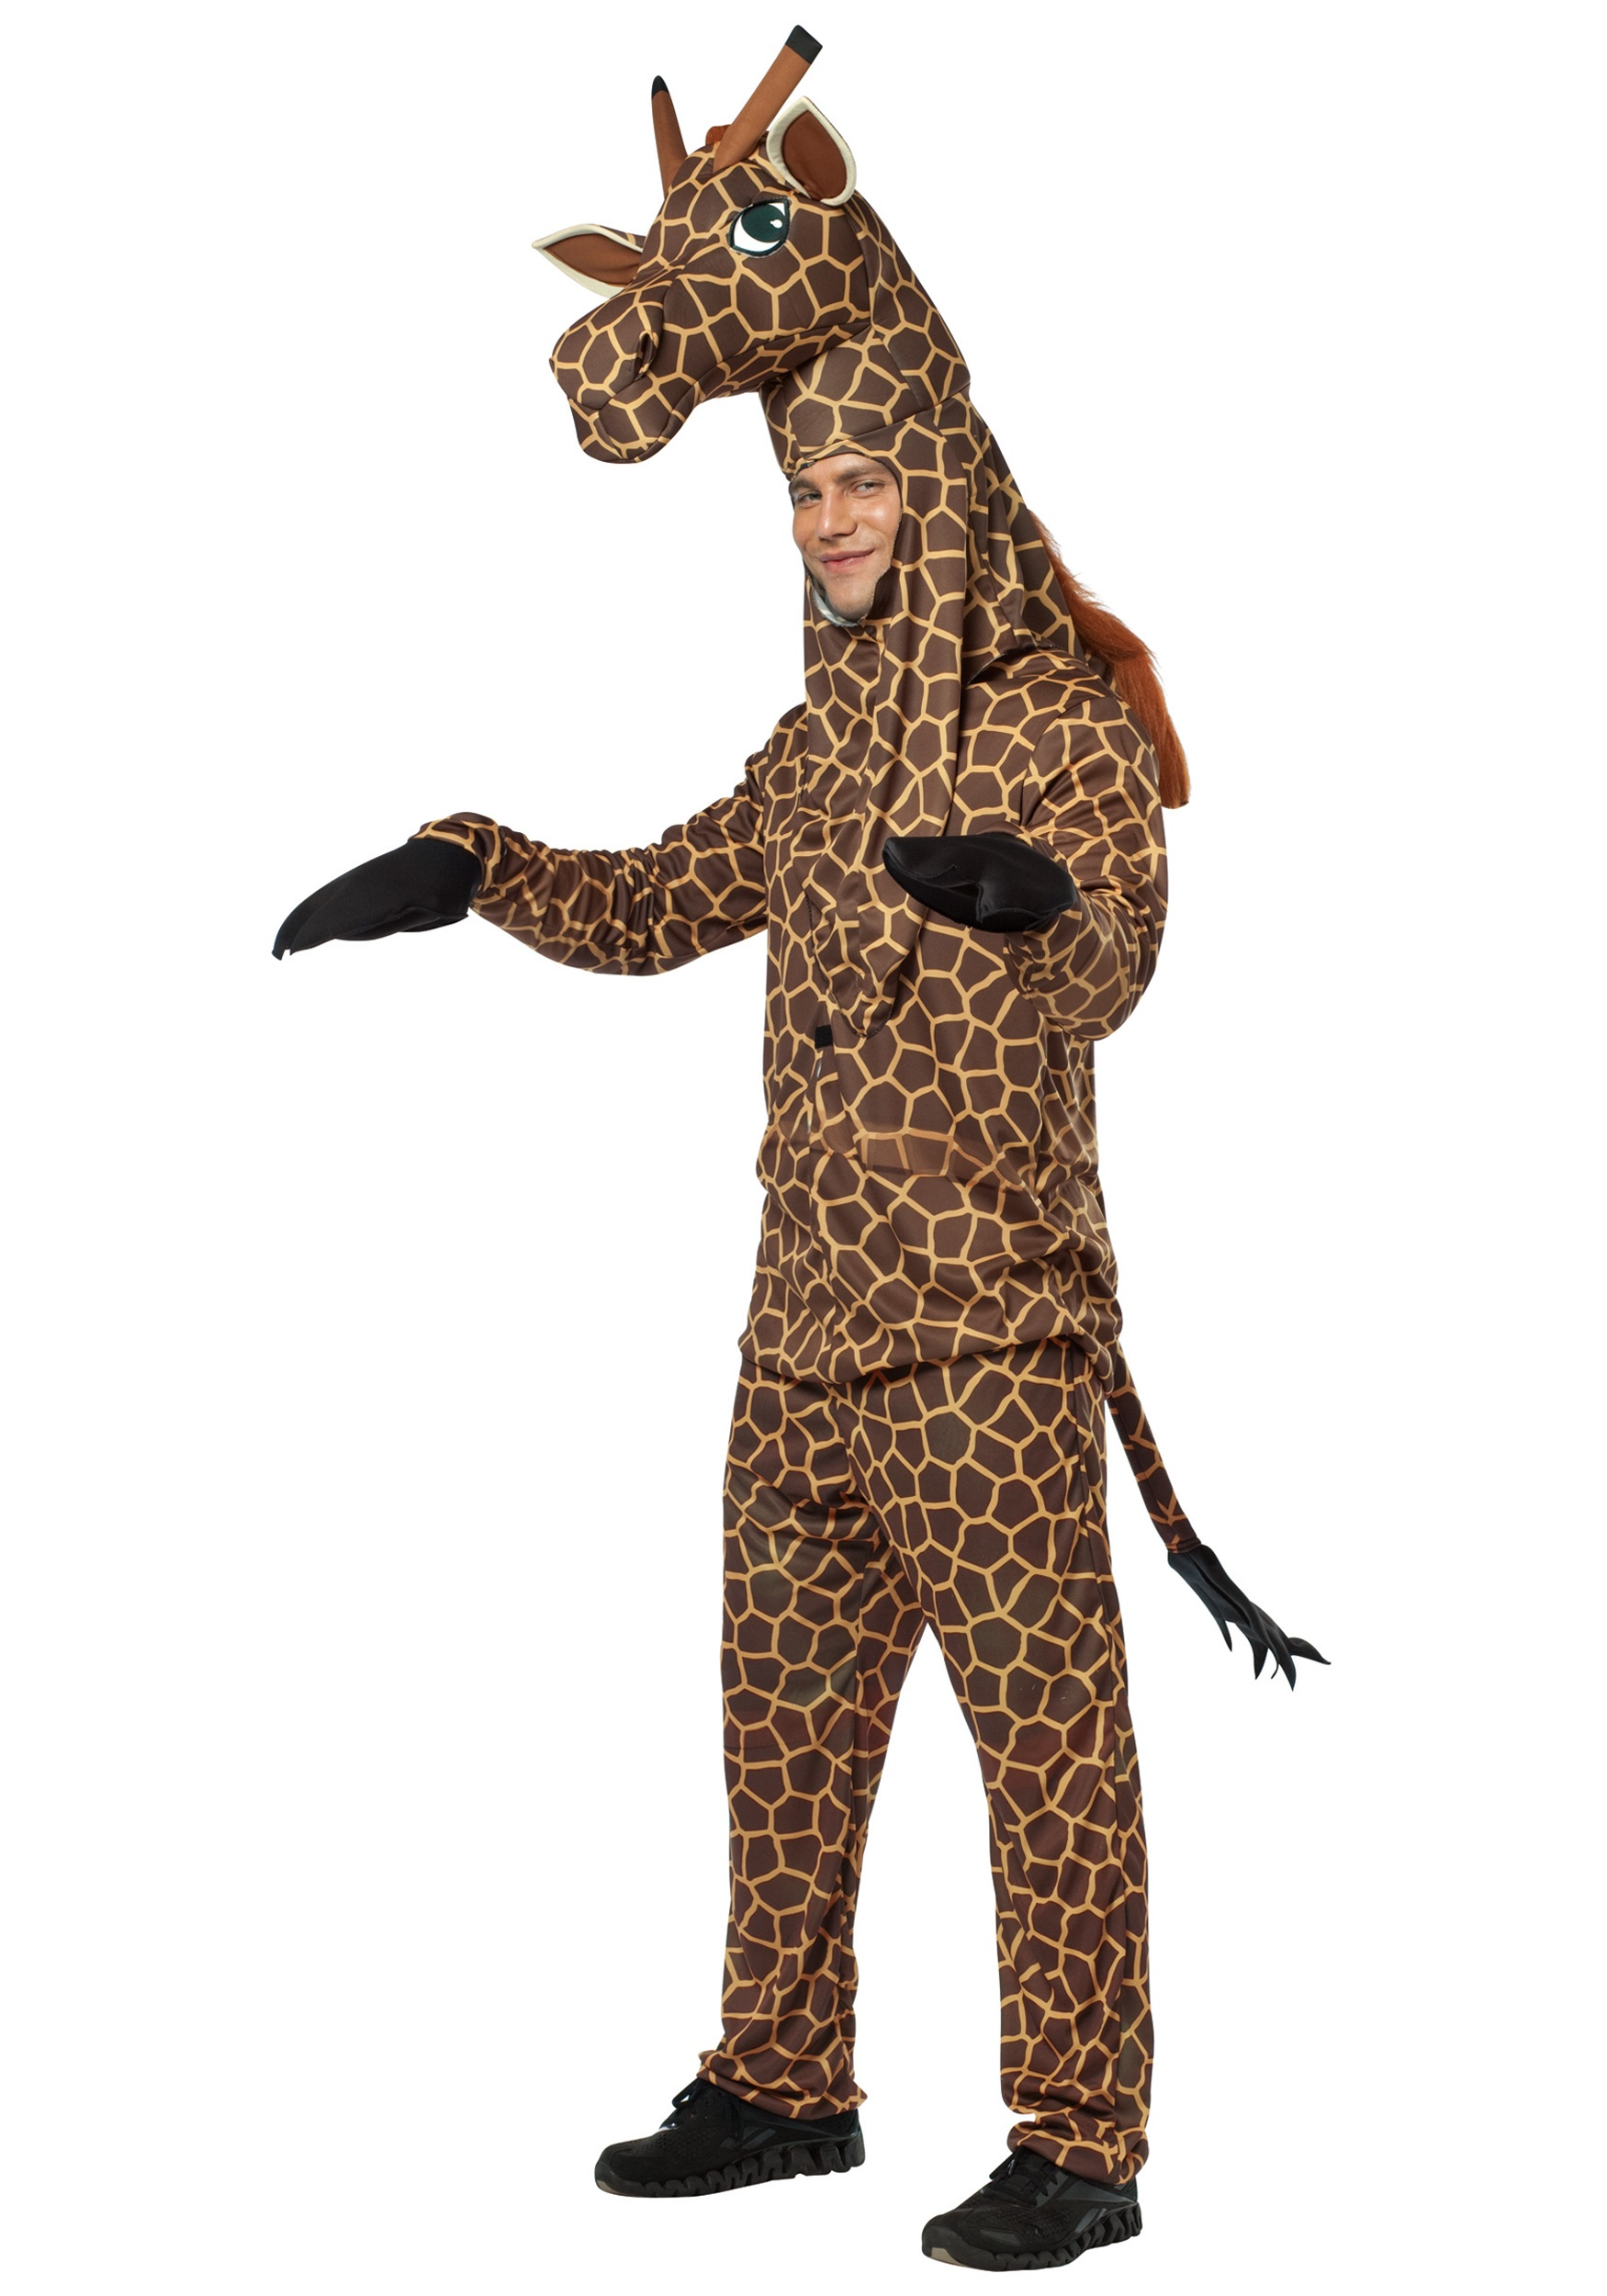 a27a761b3bb6 Adult Safari Giraffe Costume - Mens Zoo Animal Costume Ideas